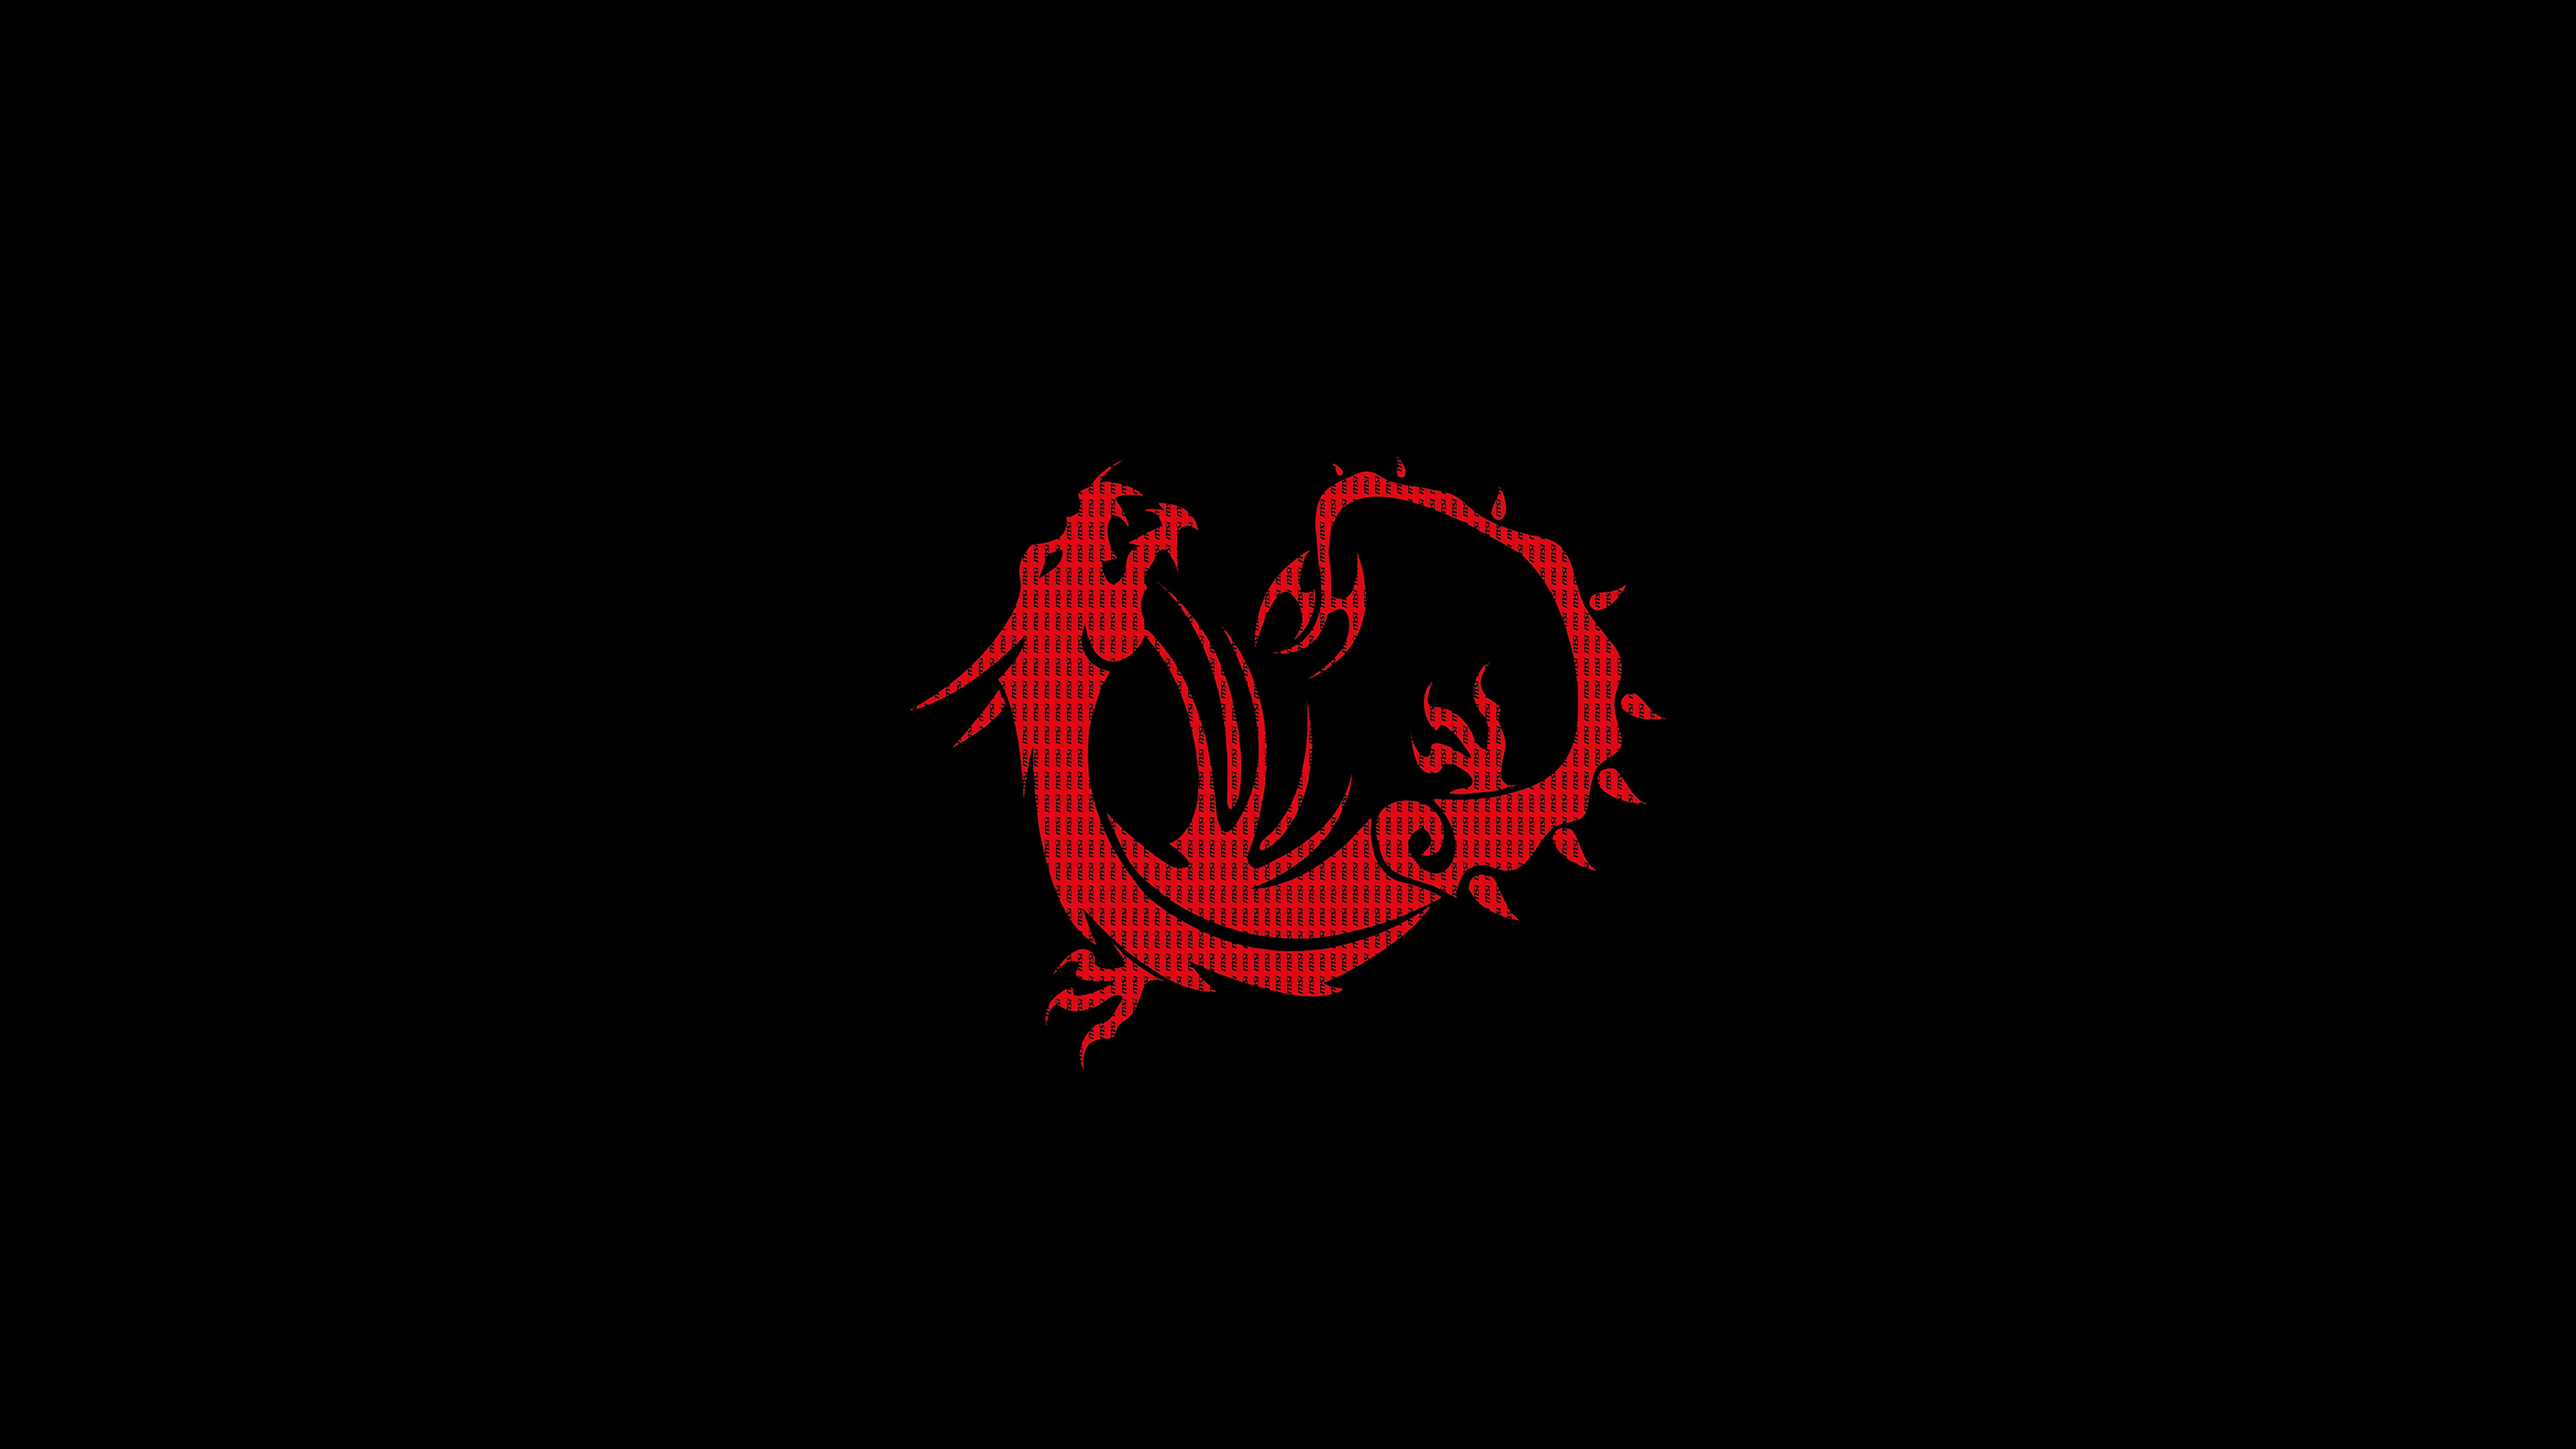 3840x2160 Red Dragon Black Minimal 4k 4k HD 4k Wallpapers ...